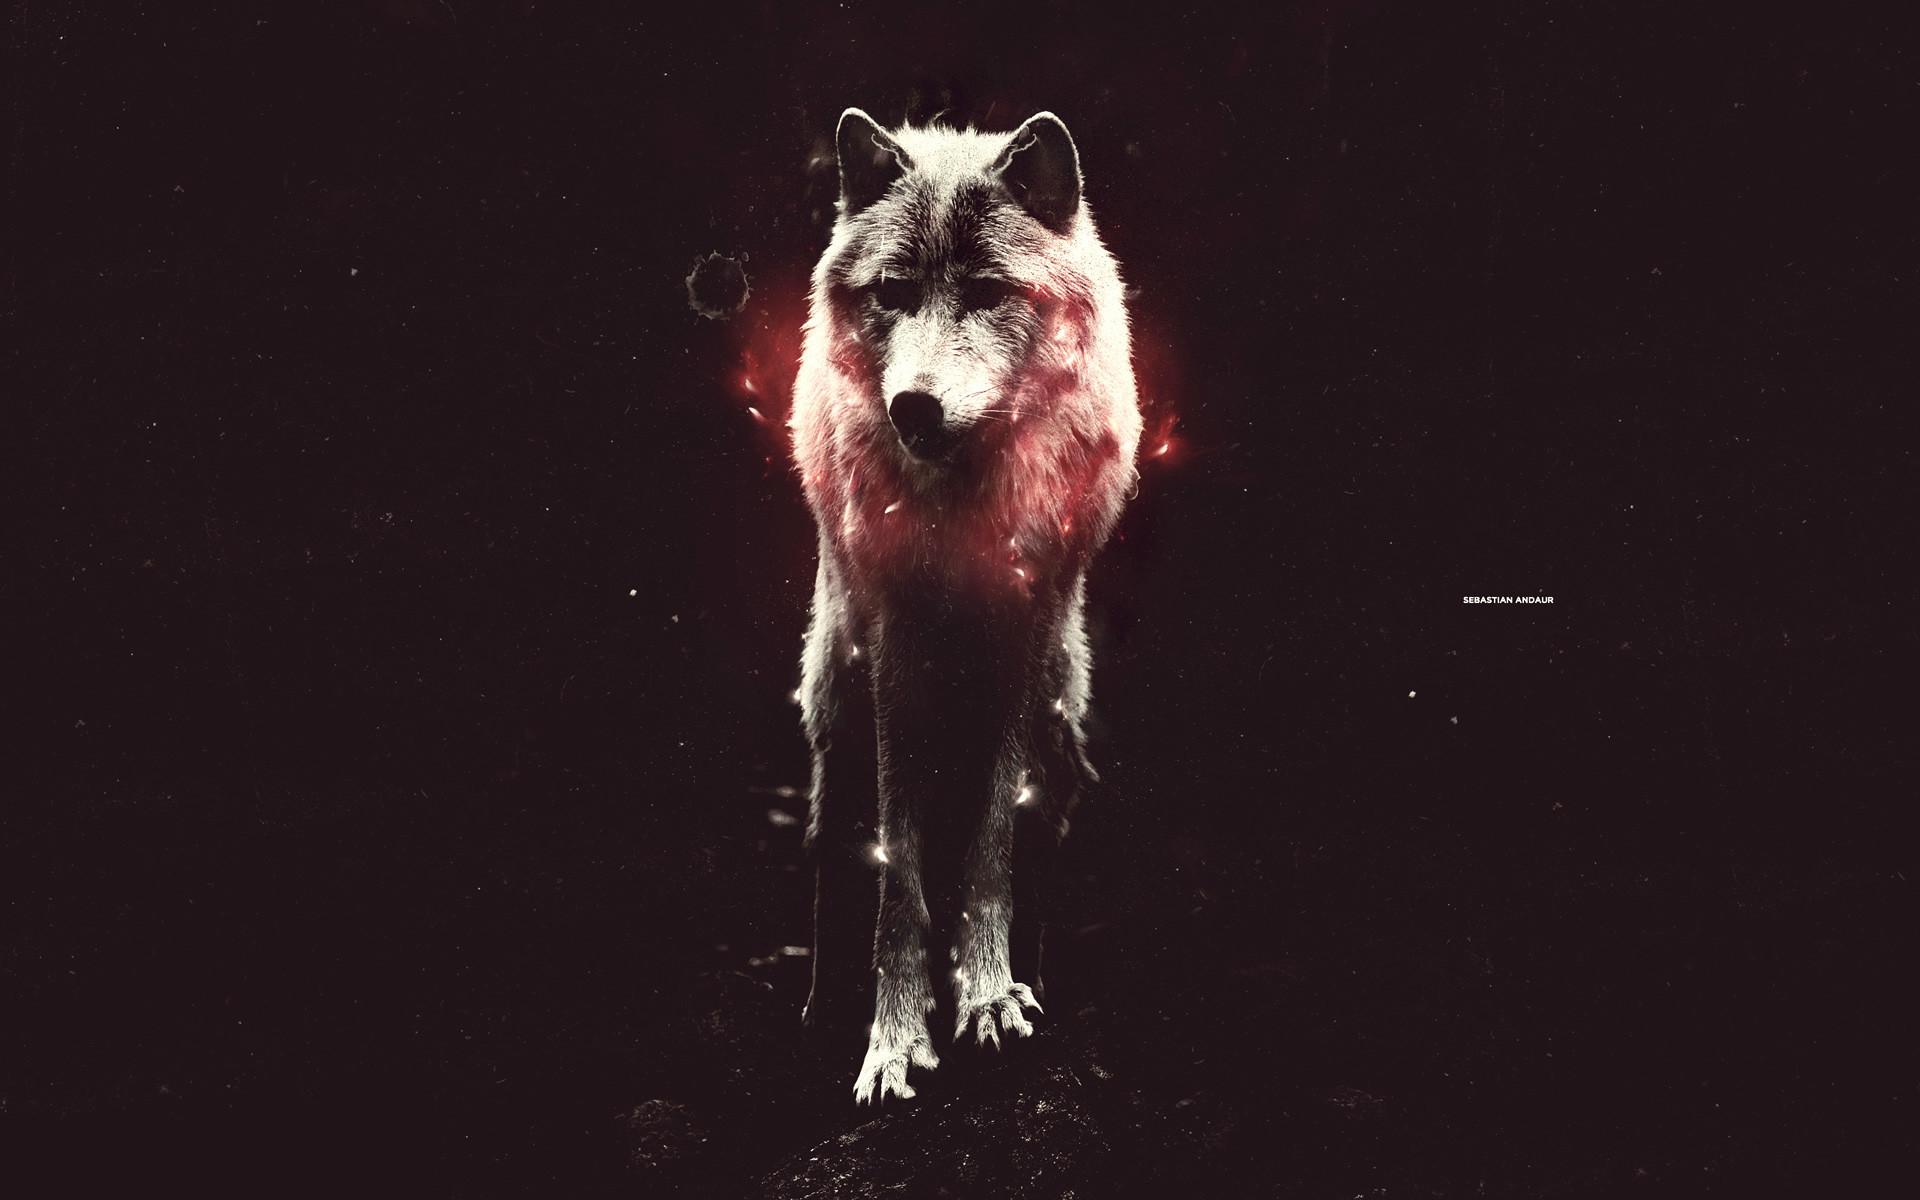 … abstract wolf wallpaper wallpapersafari …